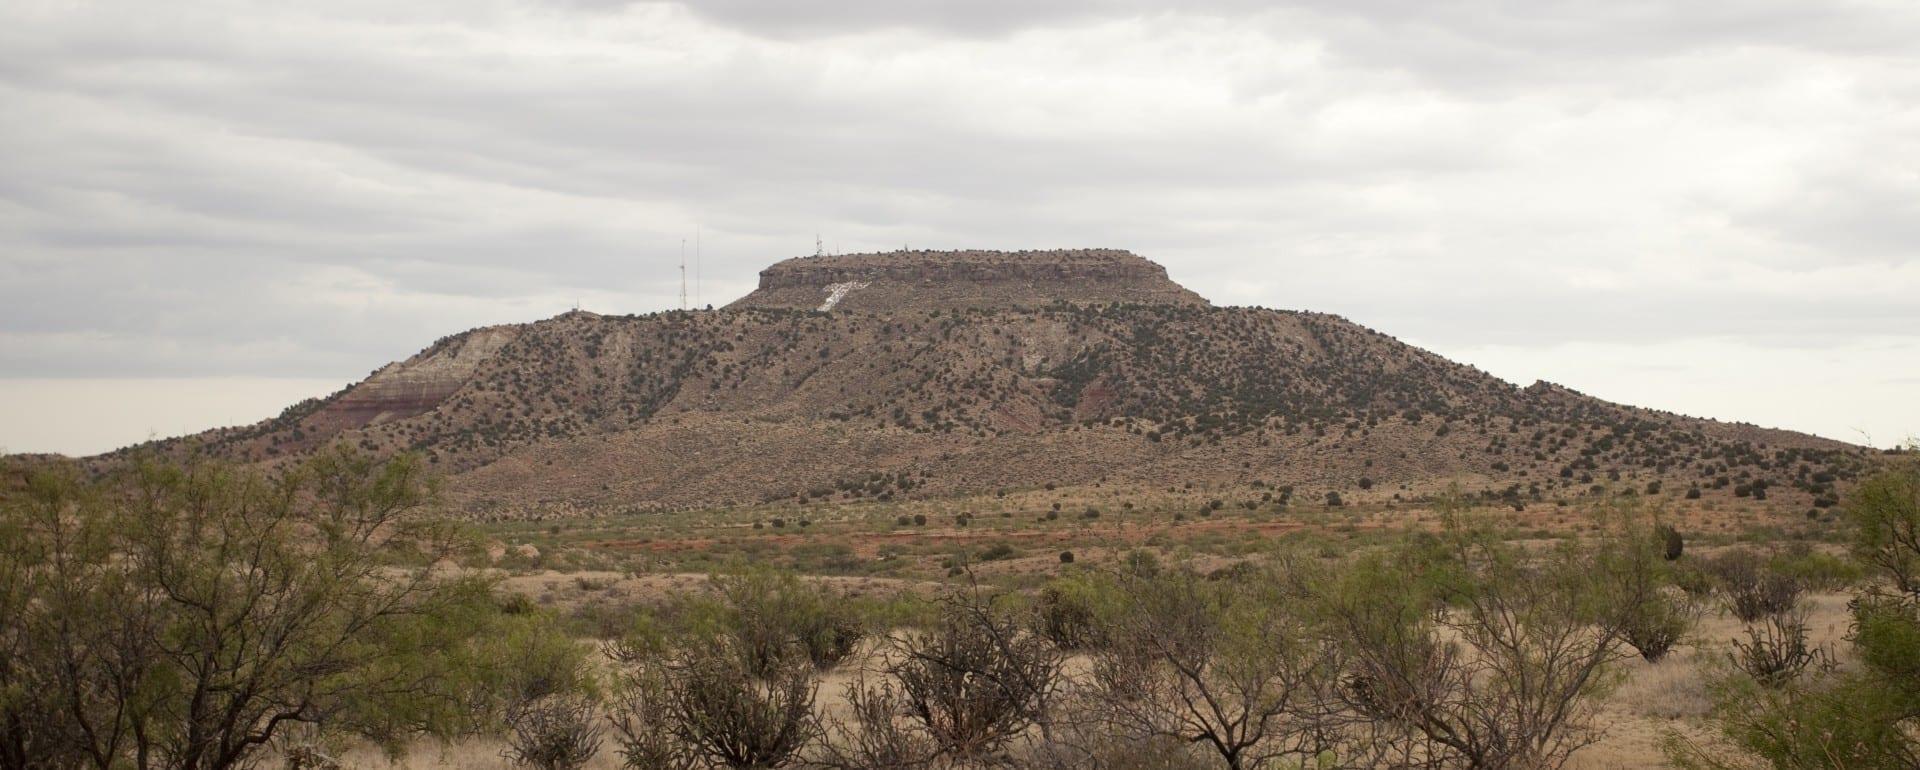 La montaña Tucumcari Tucumcari NM Estados Unidos